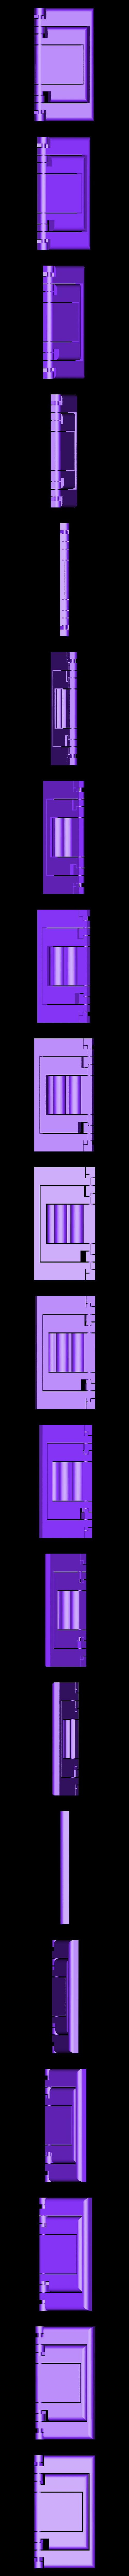 Parametric_Phone_Stand.stl Download free STL file Parametric Folding Phone Stand • 3D printing design, Zippityboomba